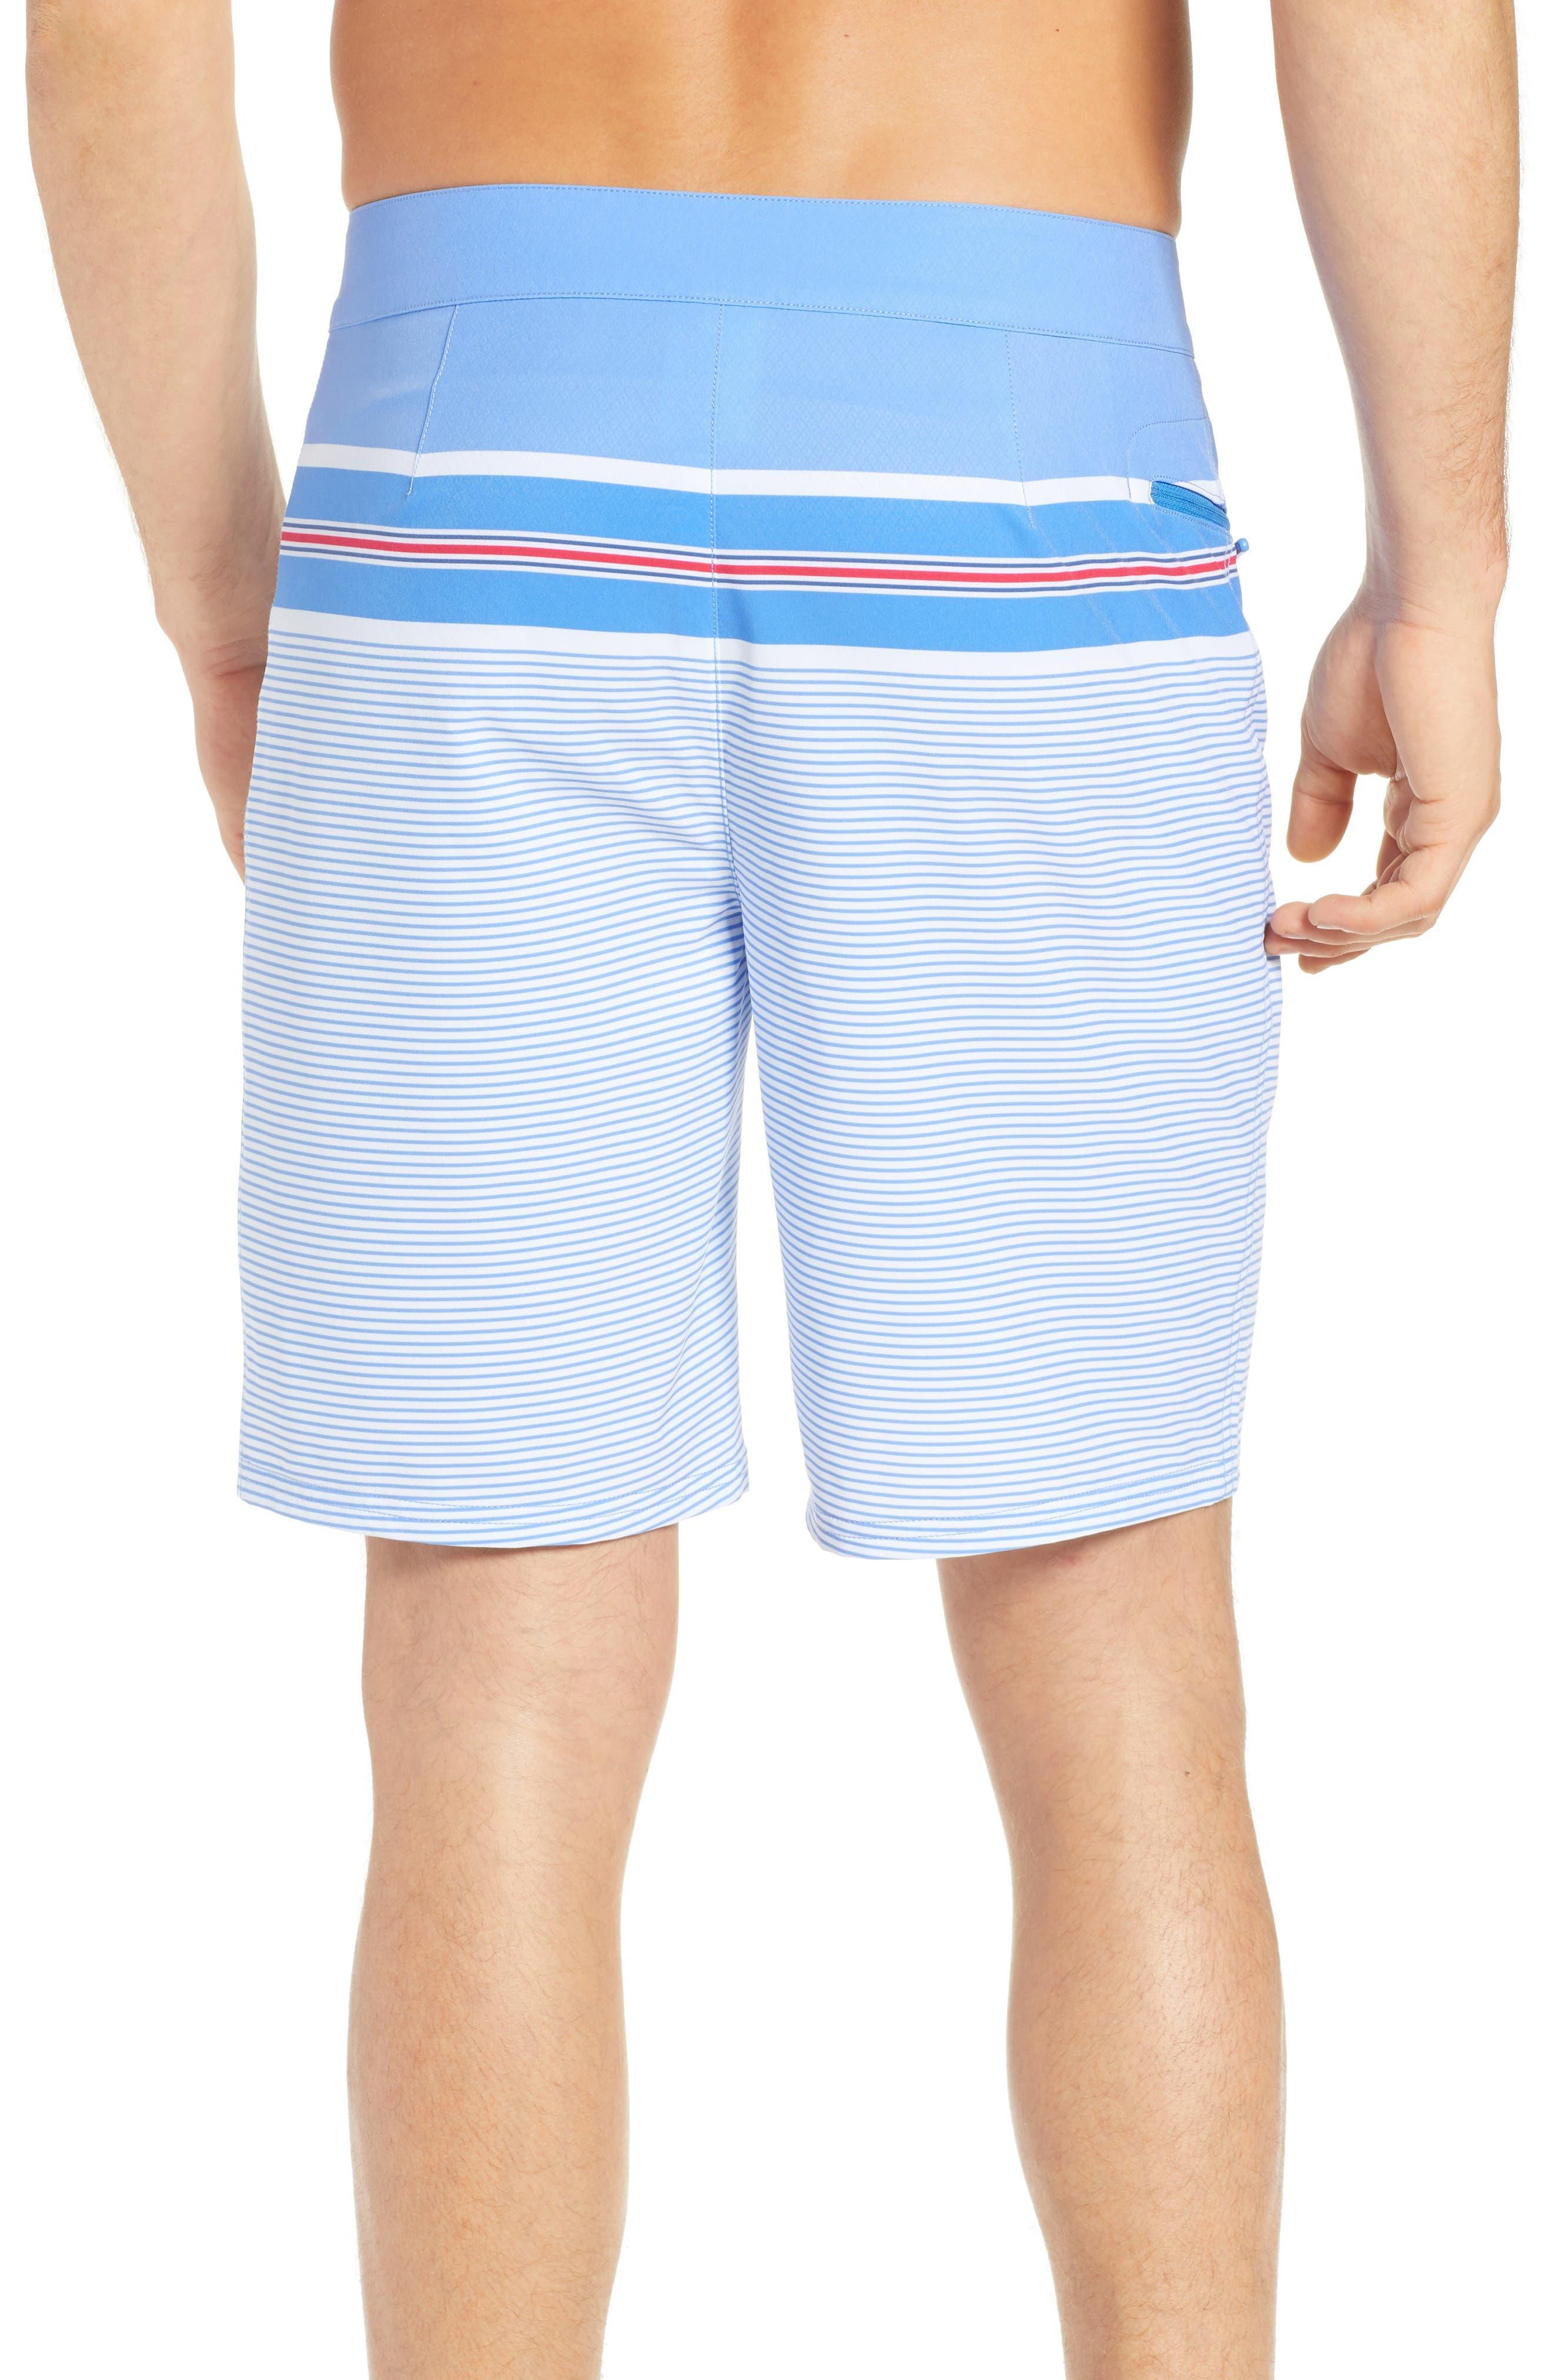 VINEYARD VINES,                             Birchcliff Stripe Board Shorts,                             Alternate thumbnail 2, color,                             484